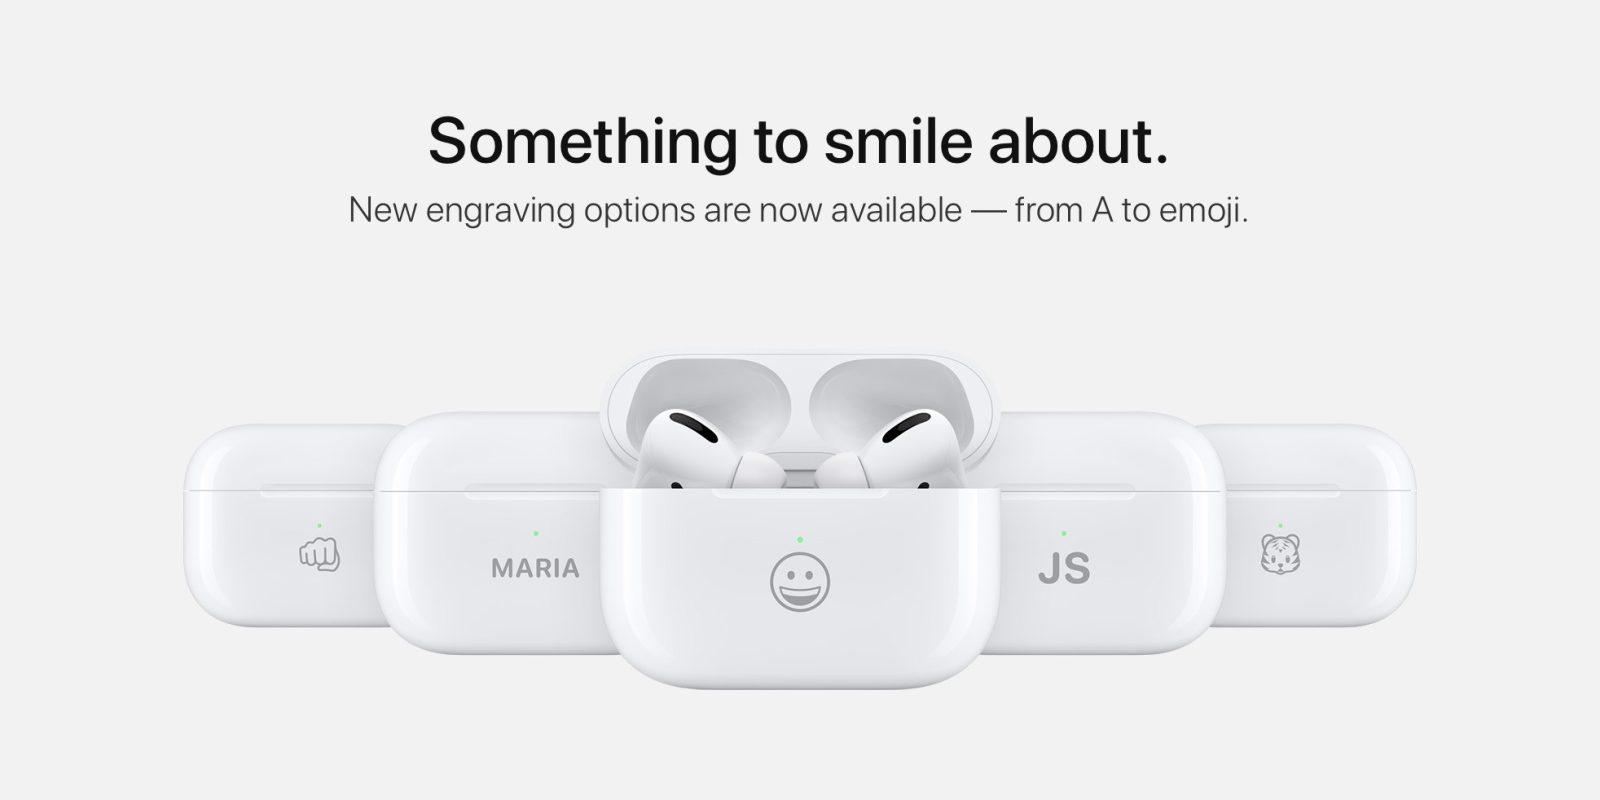 Офіційна гравіровка на AirPods Charging Case від Apple